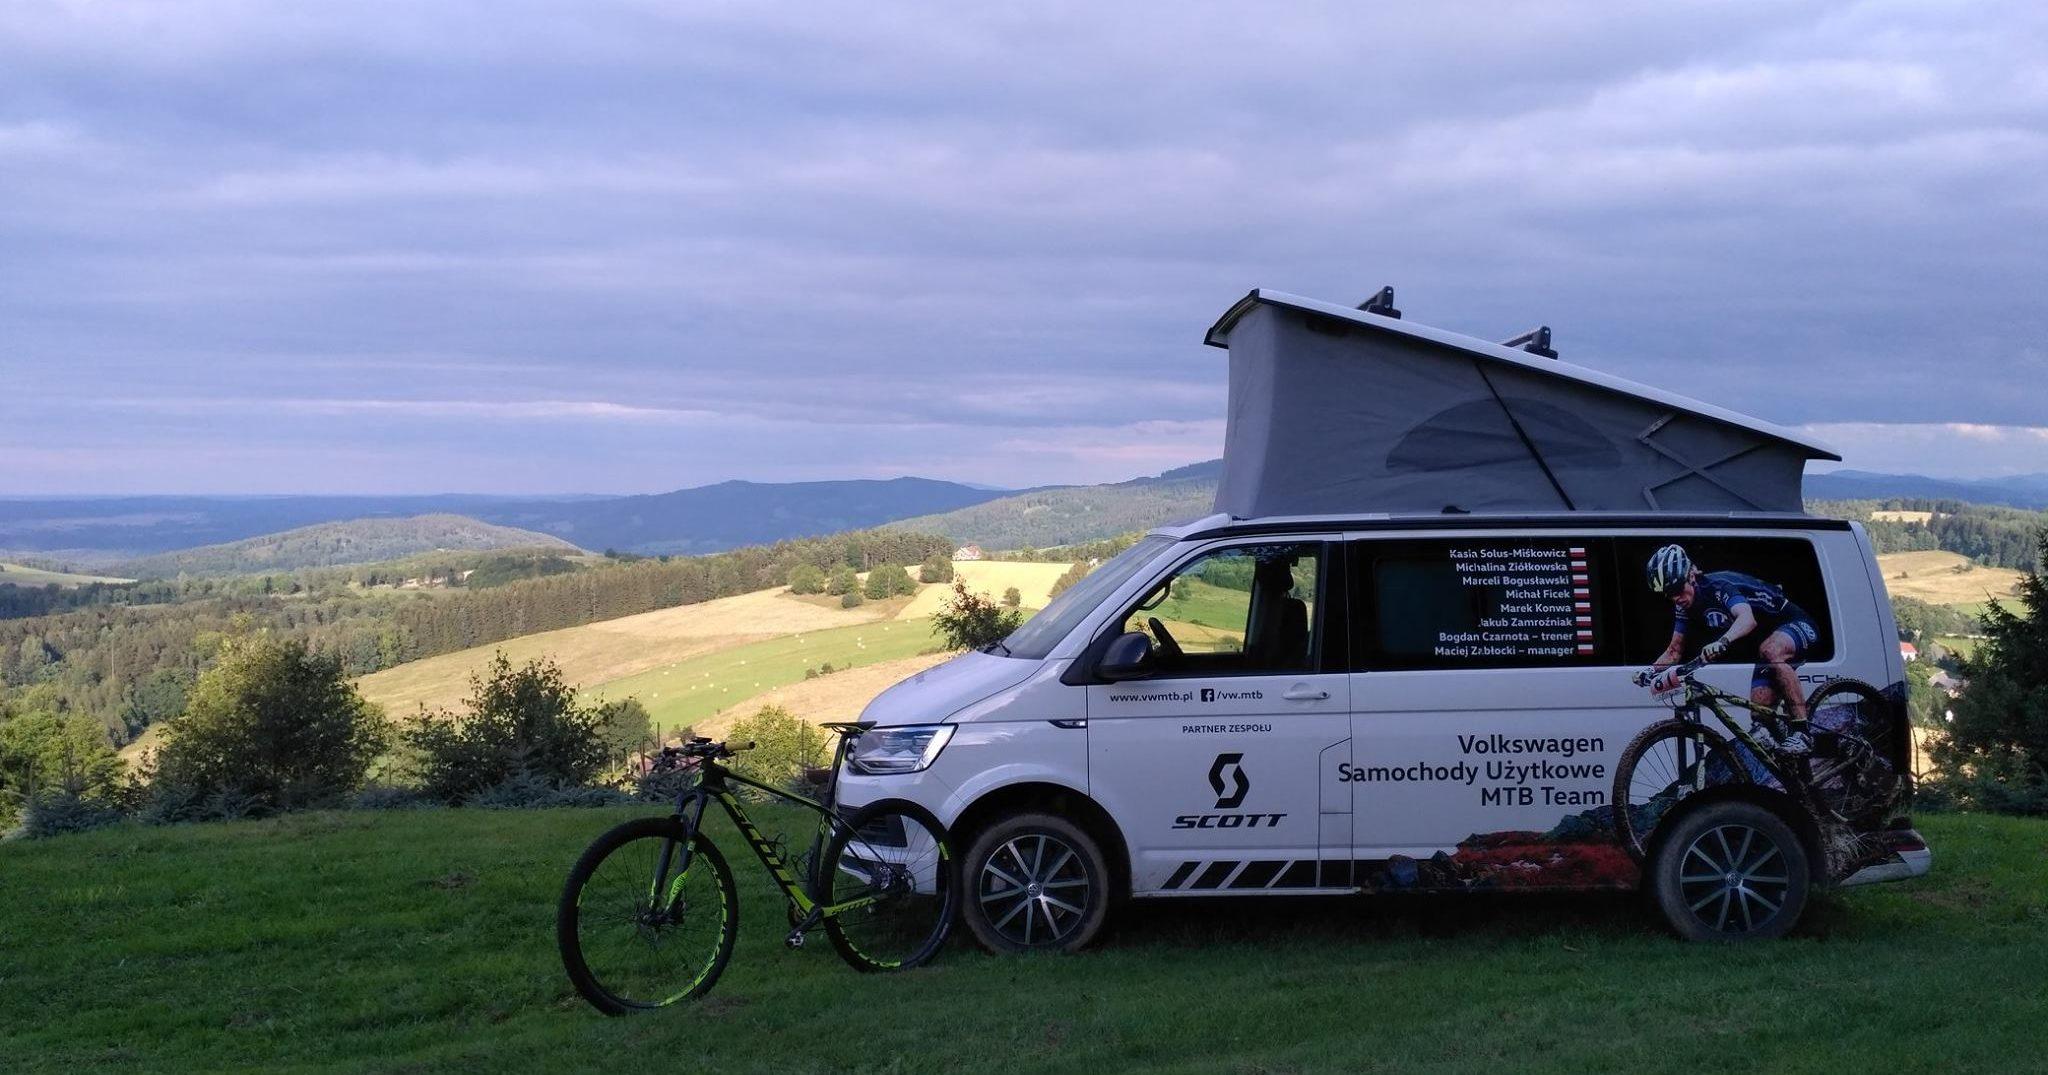 Michał Ficek (Volkswagen Samochody Użytkowe MTB Team) – Maraton MTB Kargula i Pawlaka / GP Kaczmarek Electric MTB